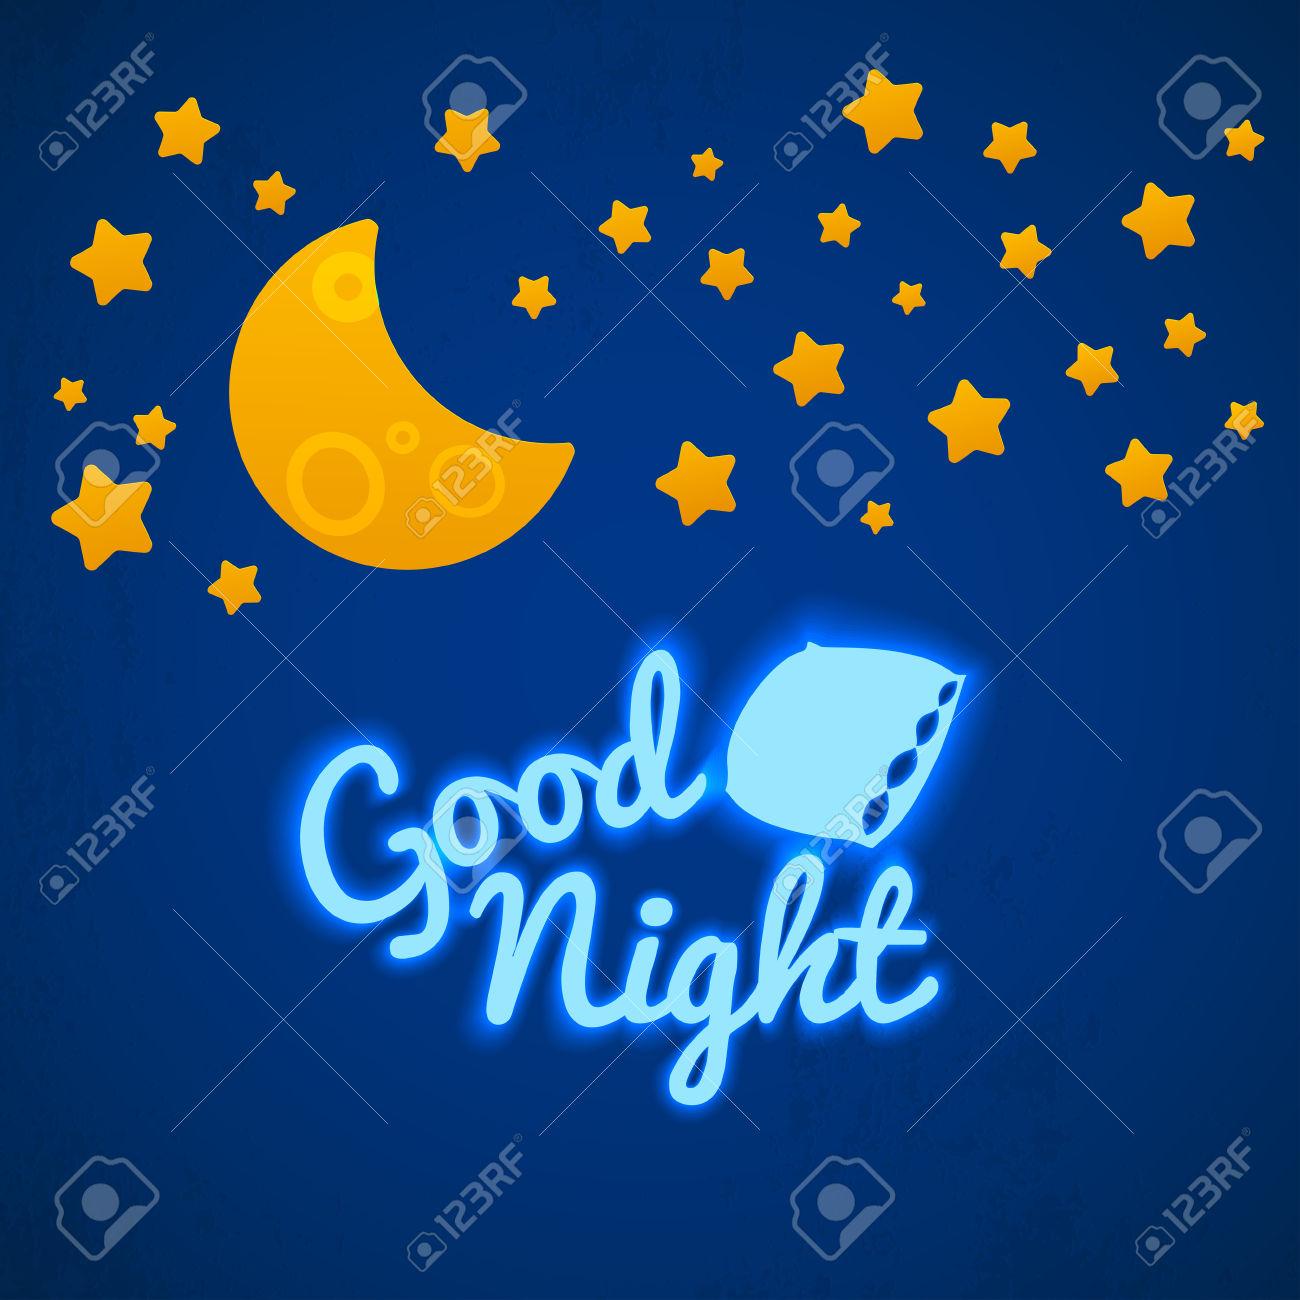 good night: Good Night Bed .